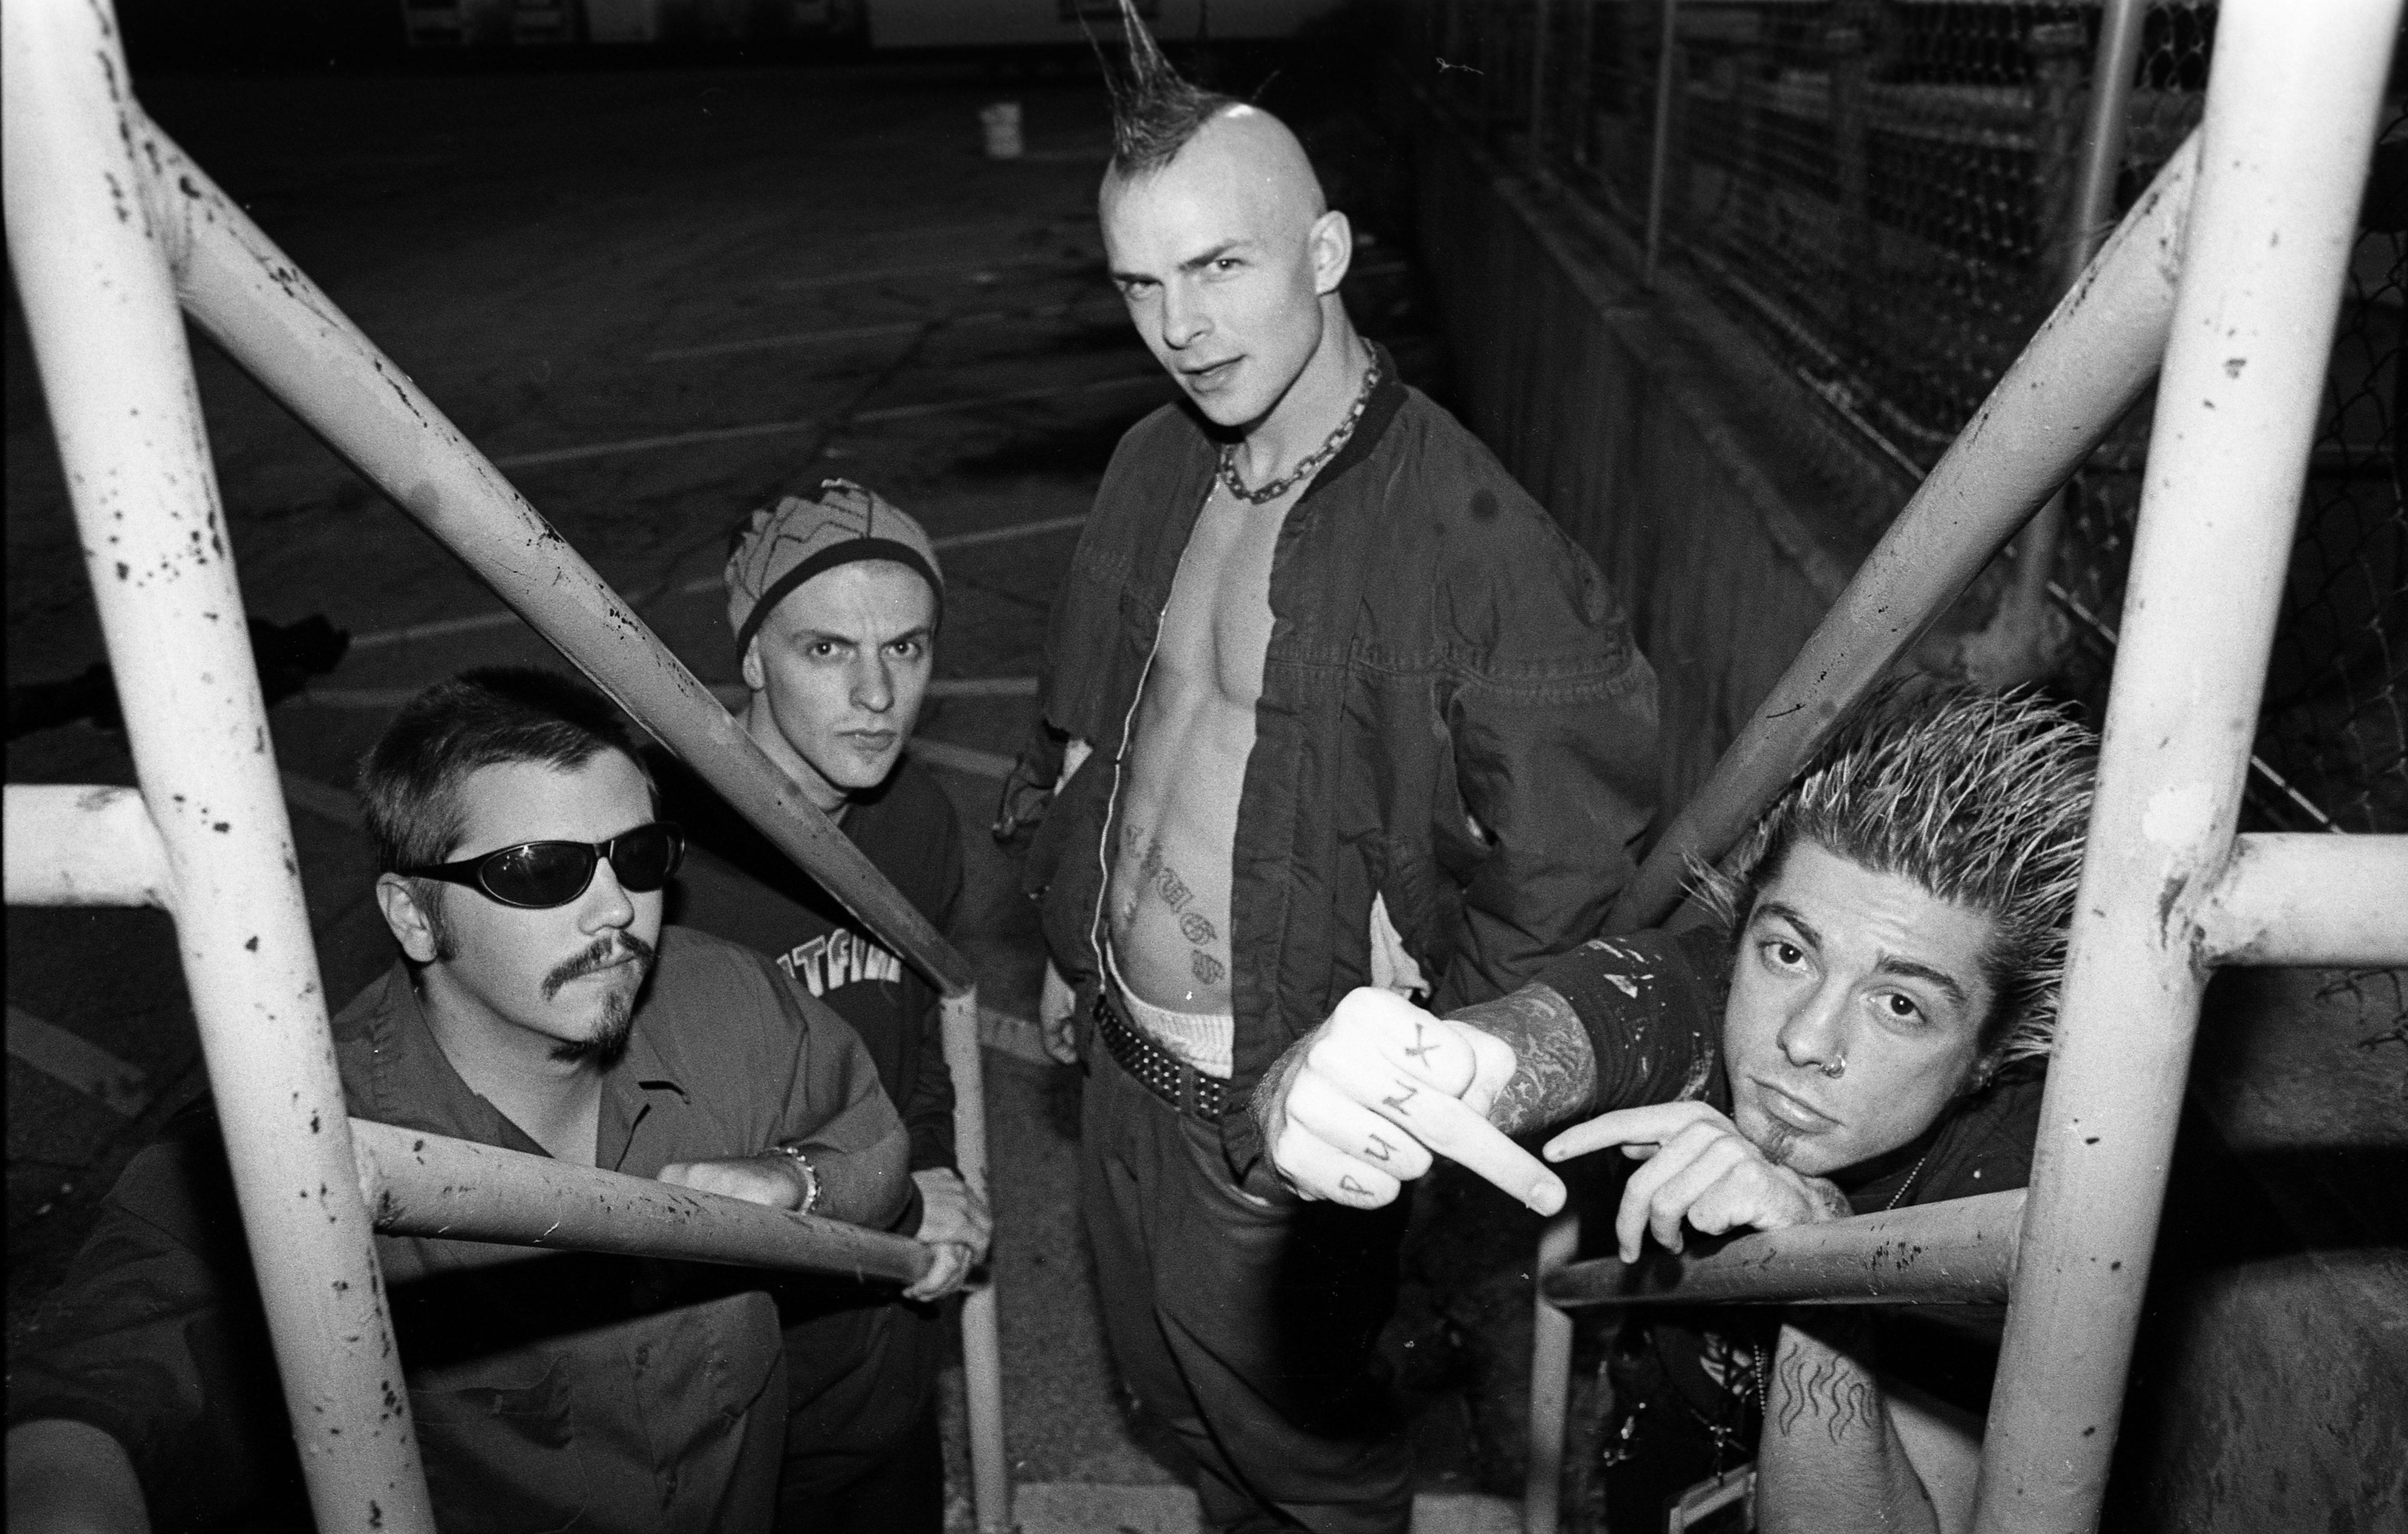 Rancid in 1994